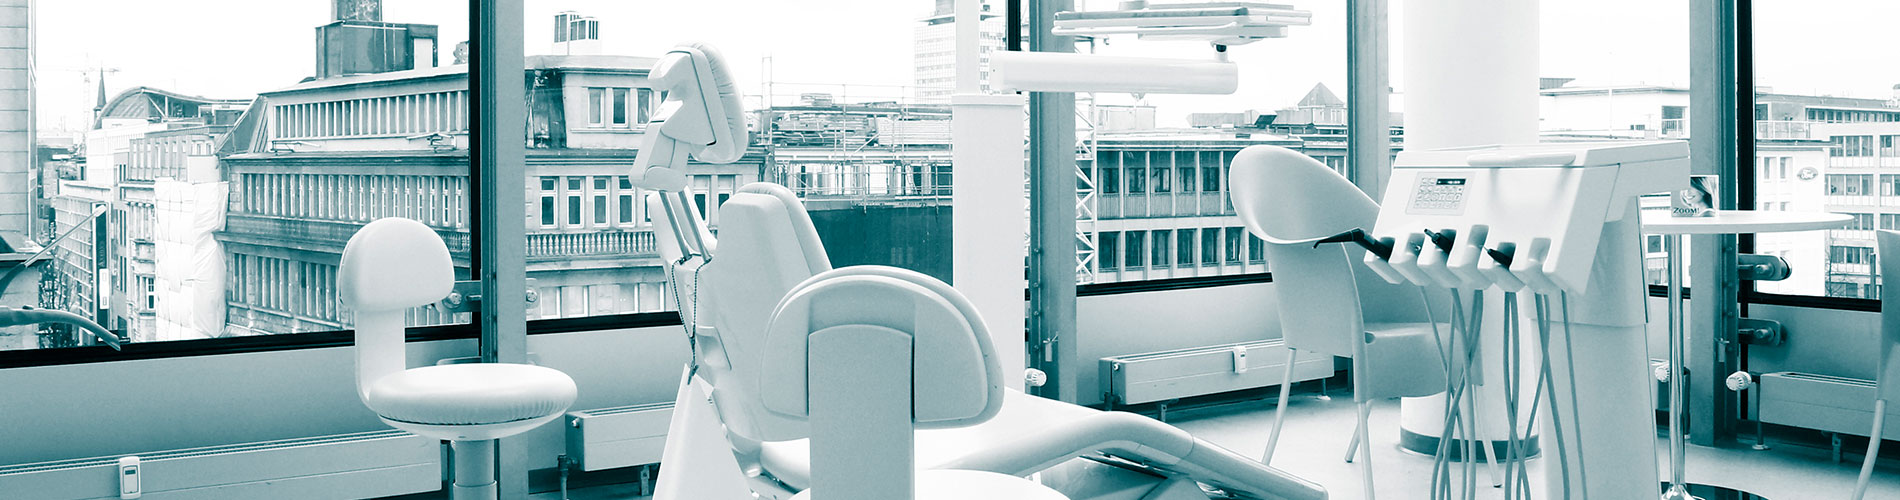 Karriere Zahnarzt Köln - Moderne Praxis im Herzen Kölns